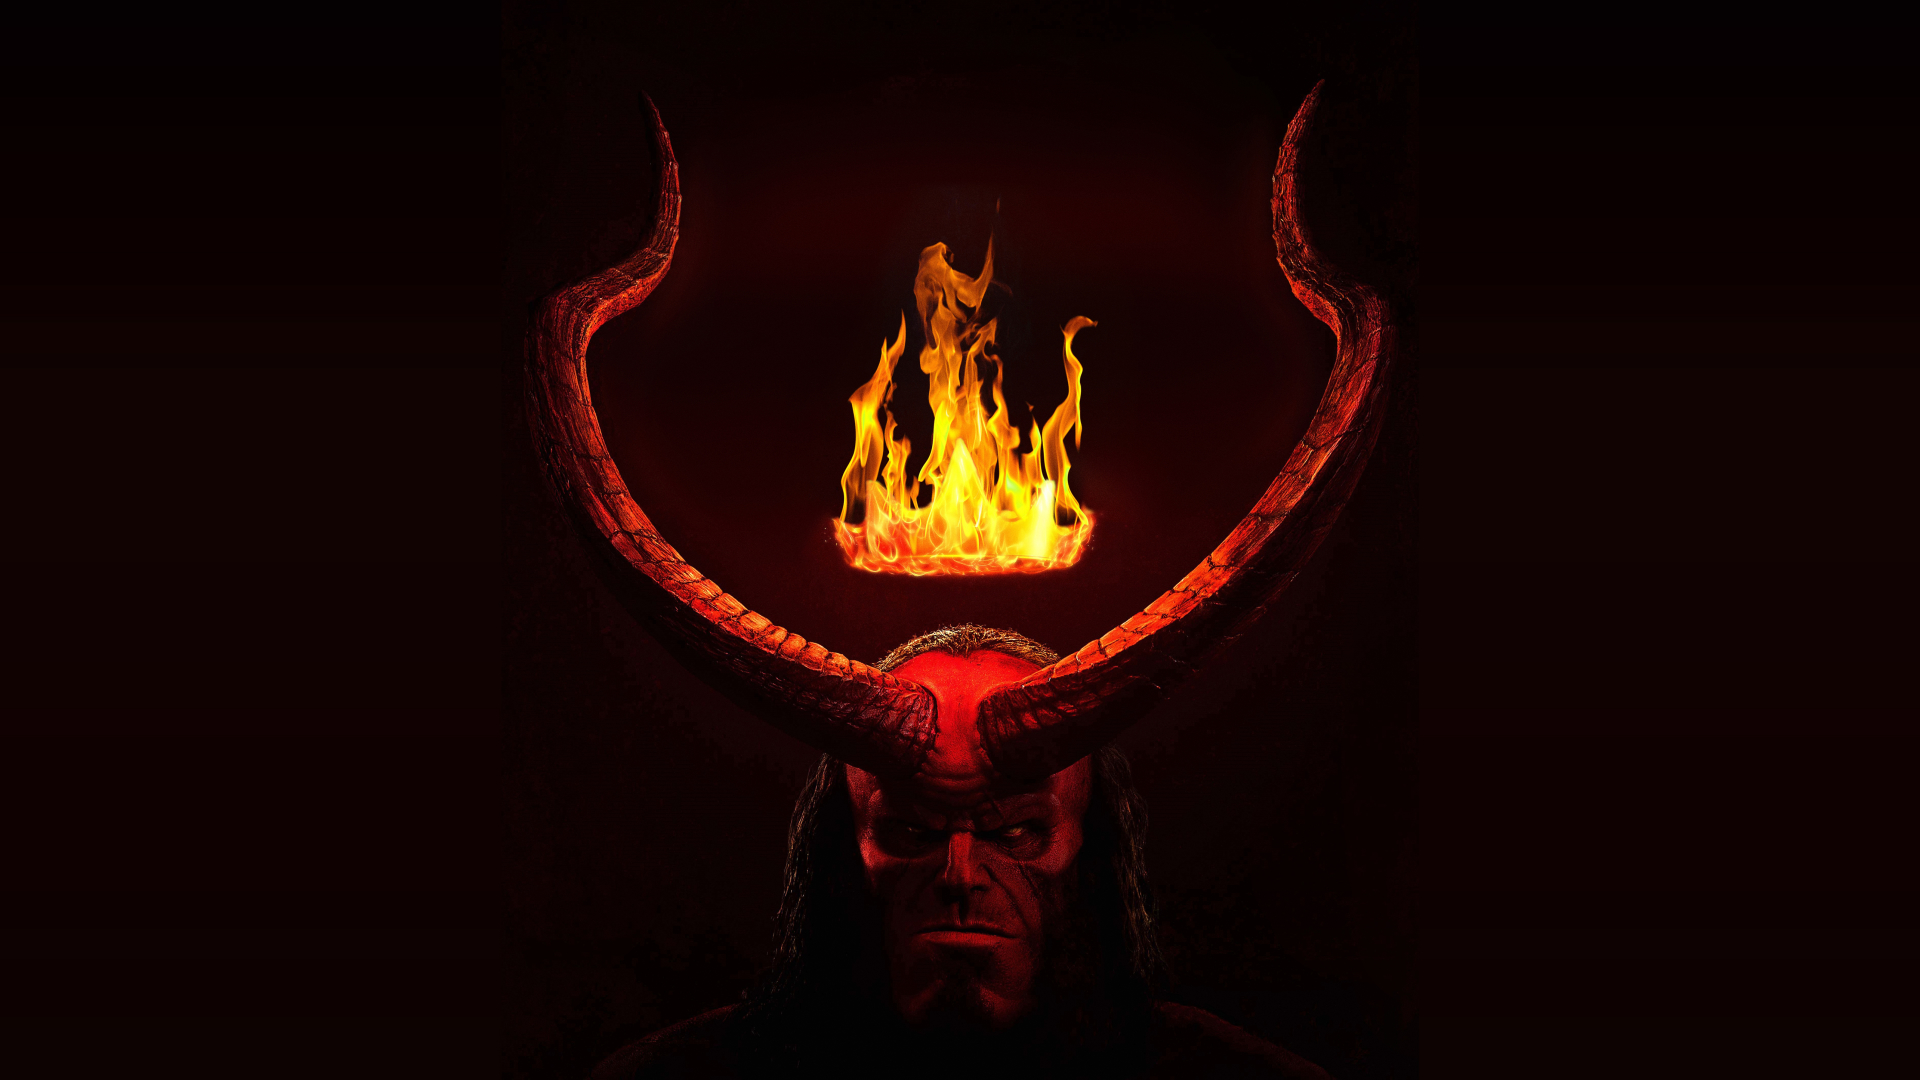 1920x1080 Hellboy 2019 Movie Poster 1080p Laptop Full Hd